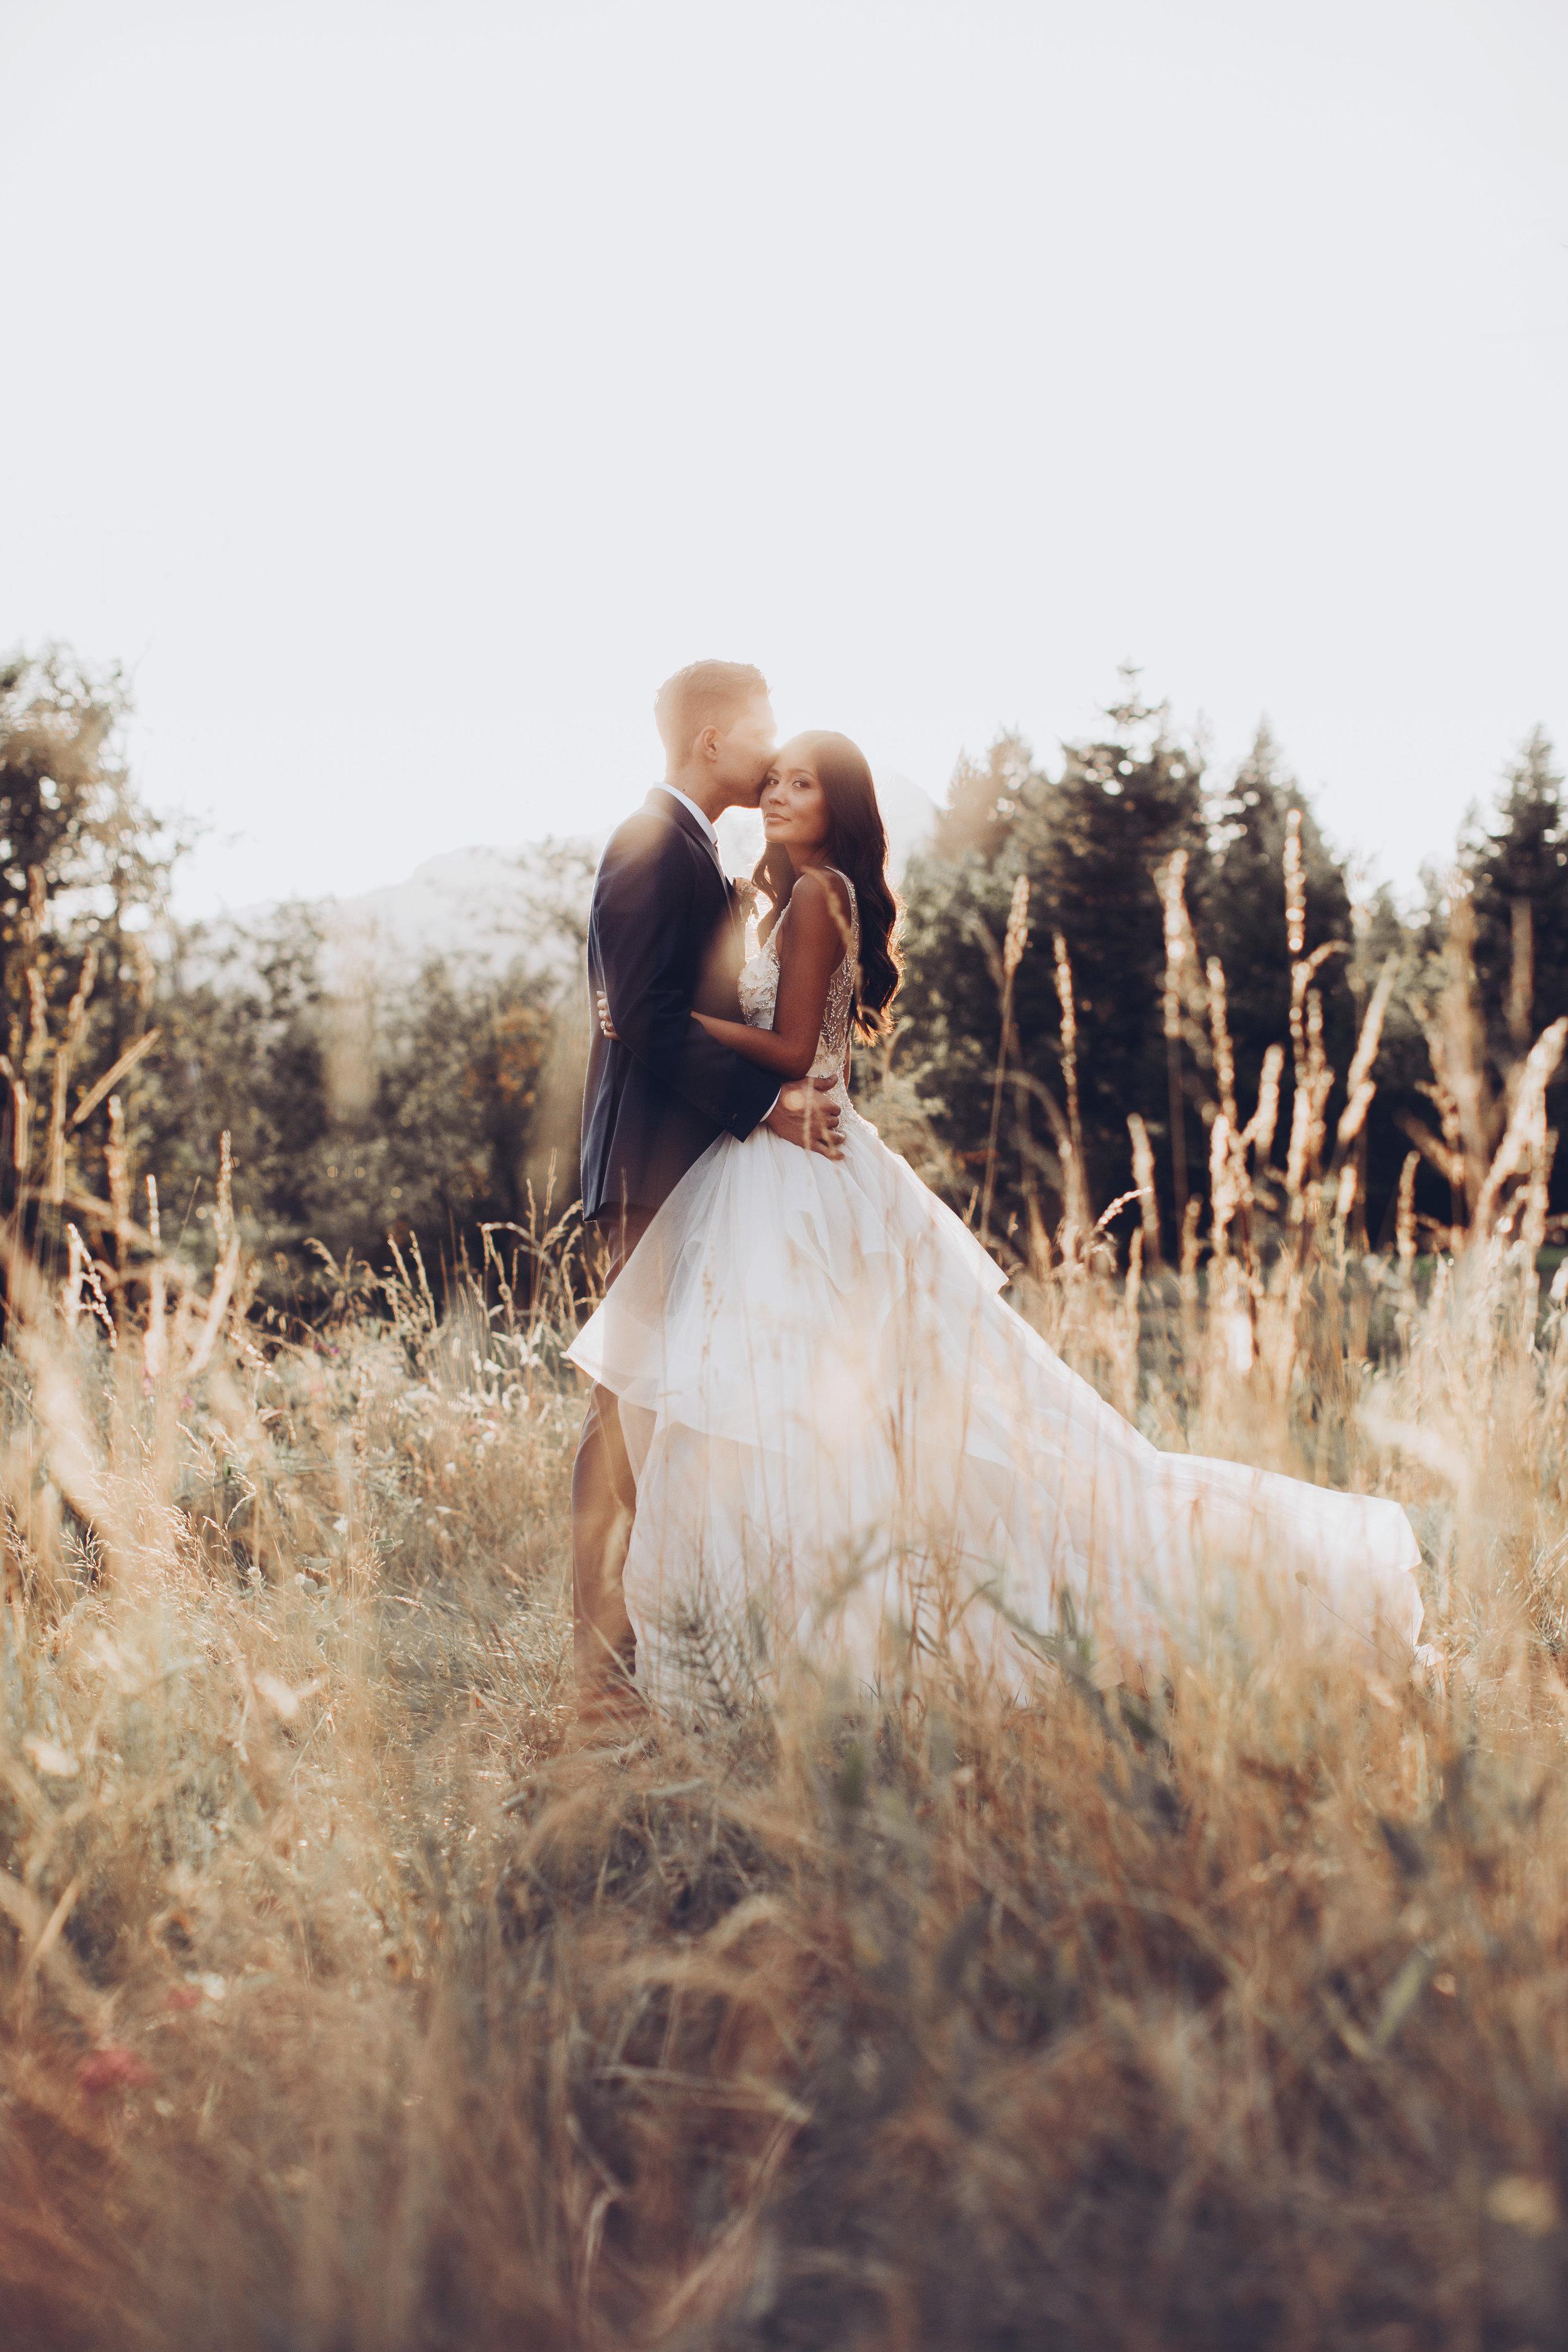 PORTLAND WEDDING-CHRNFORCE-JENNY CHOKBENGBOUN PHOTO PORTLAND OREGON WEDDING-438.jpg